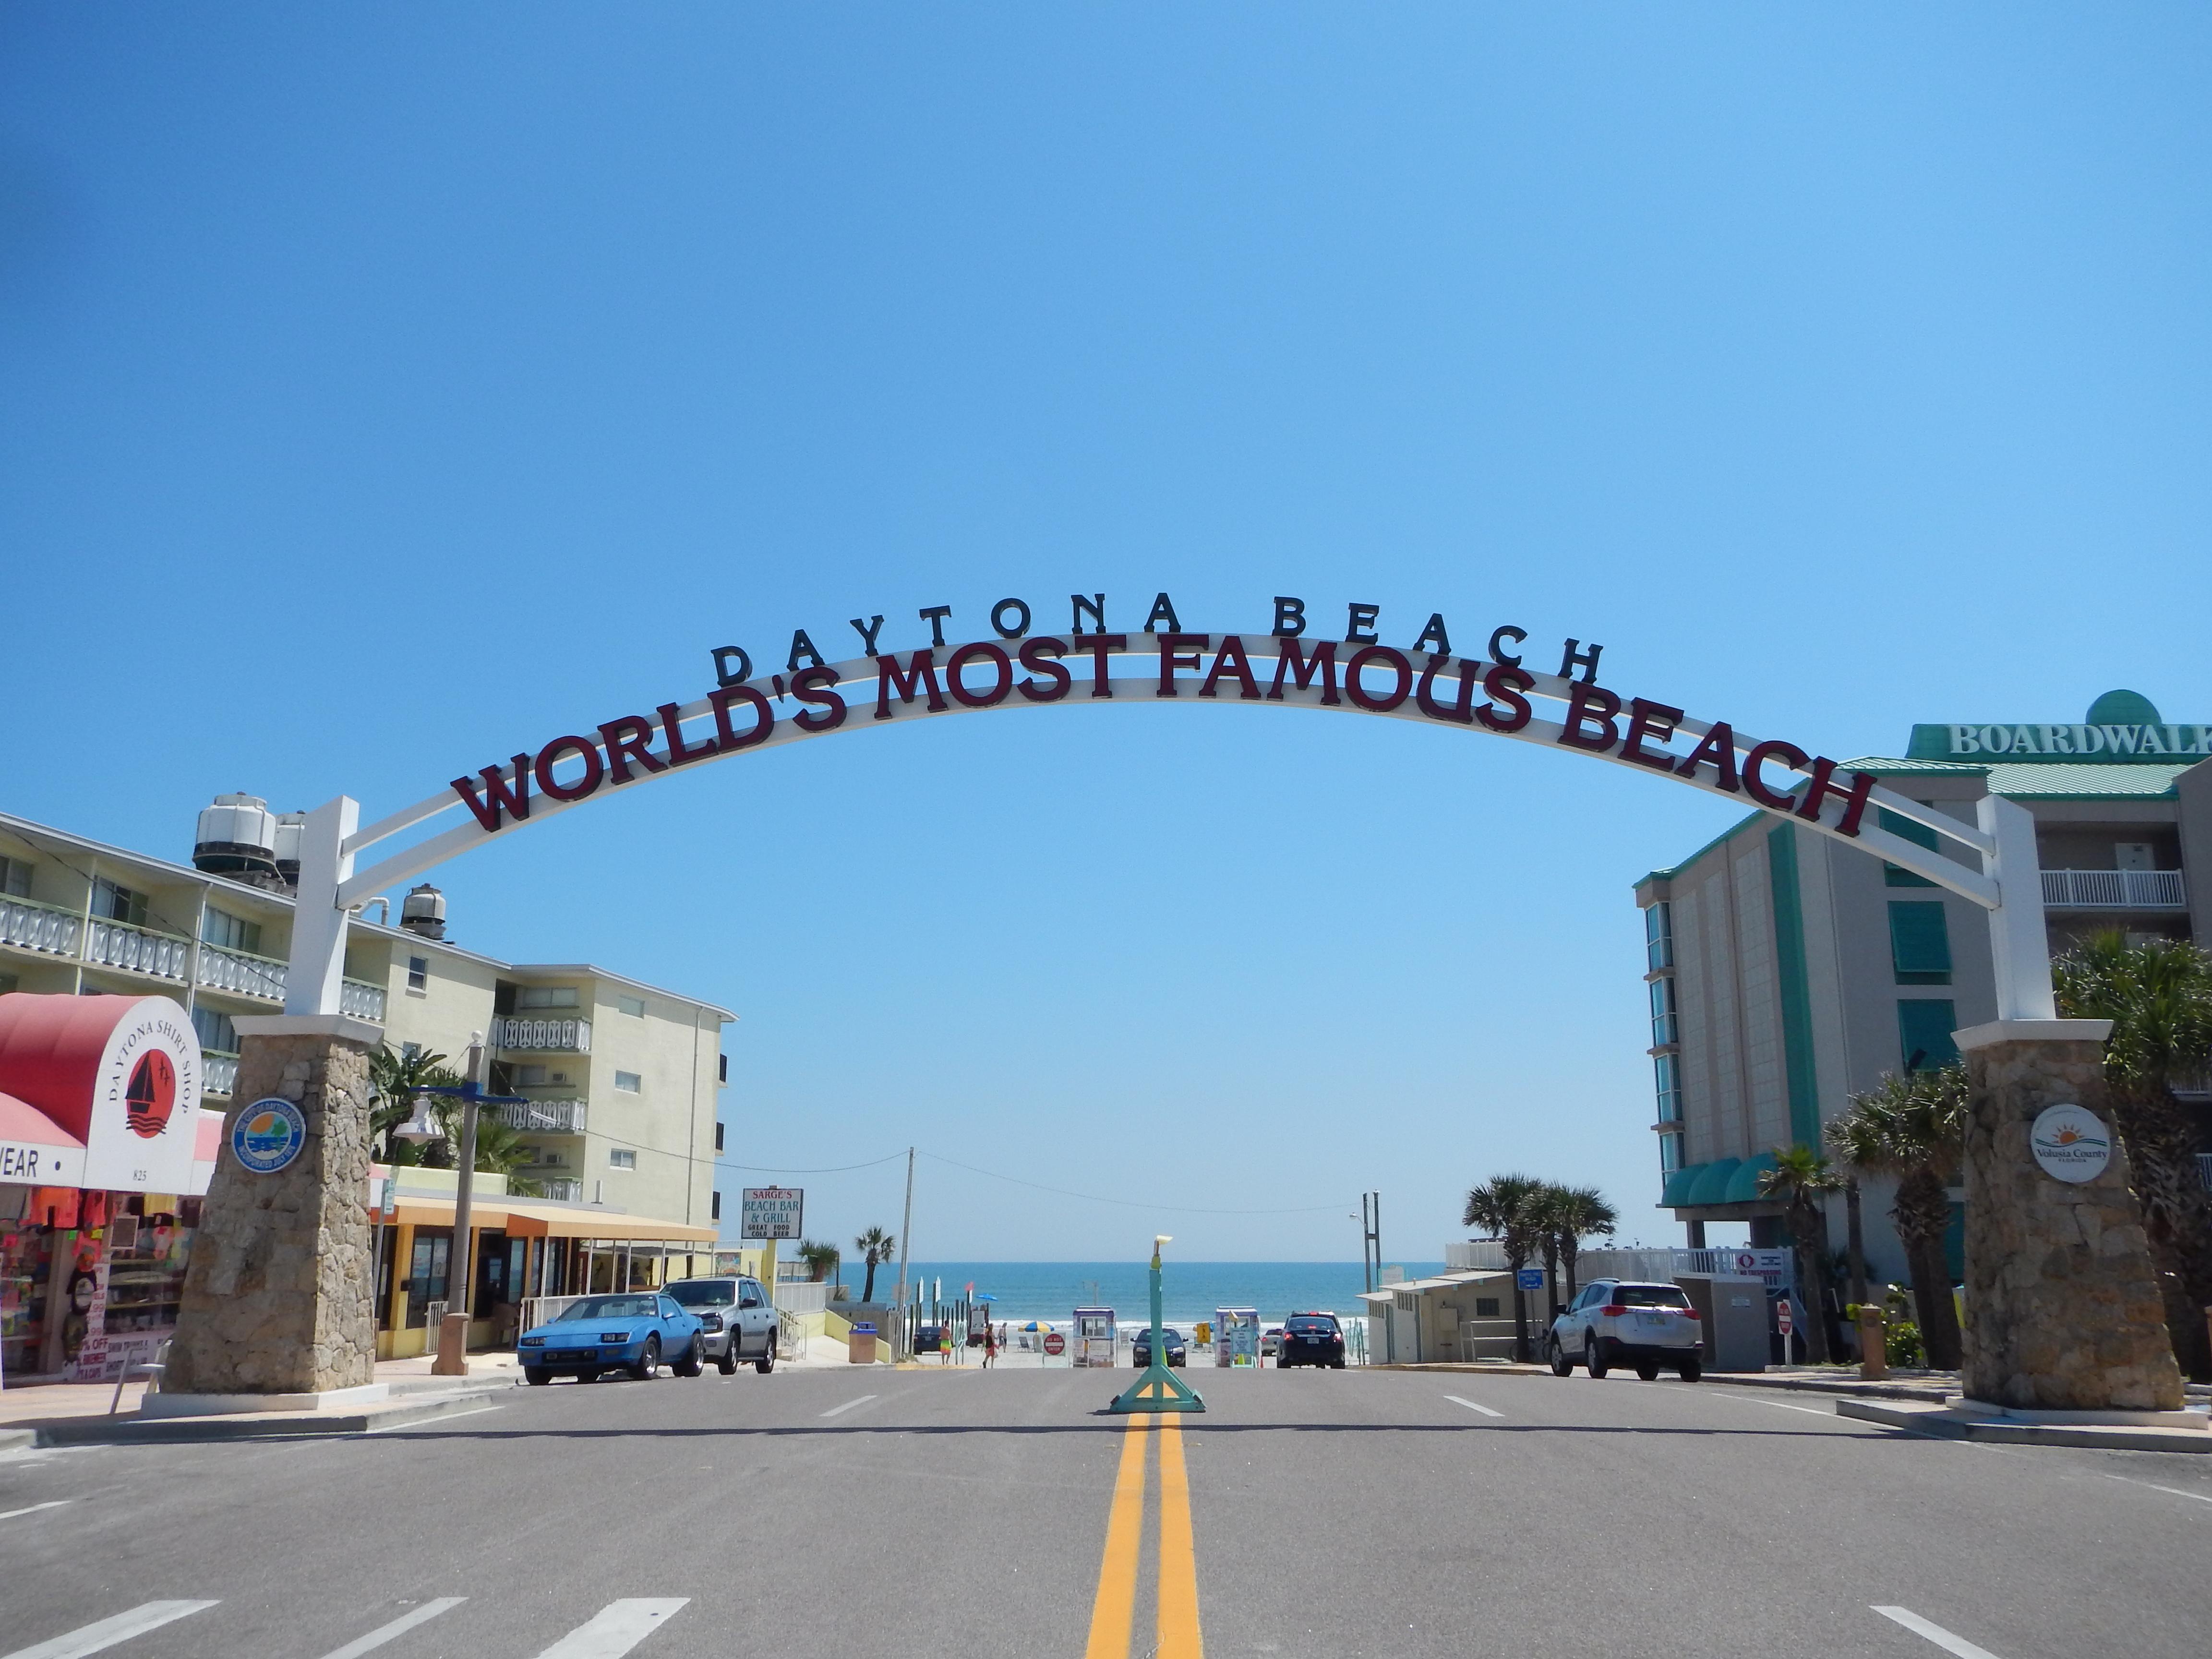 Best Western Hotel Daytona Beach Florida